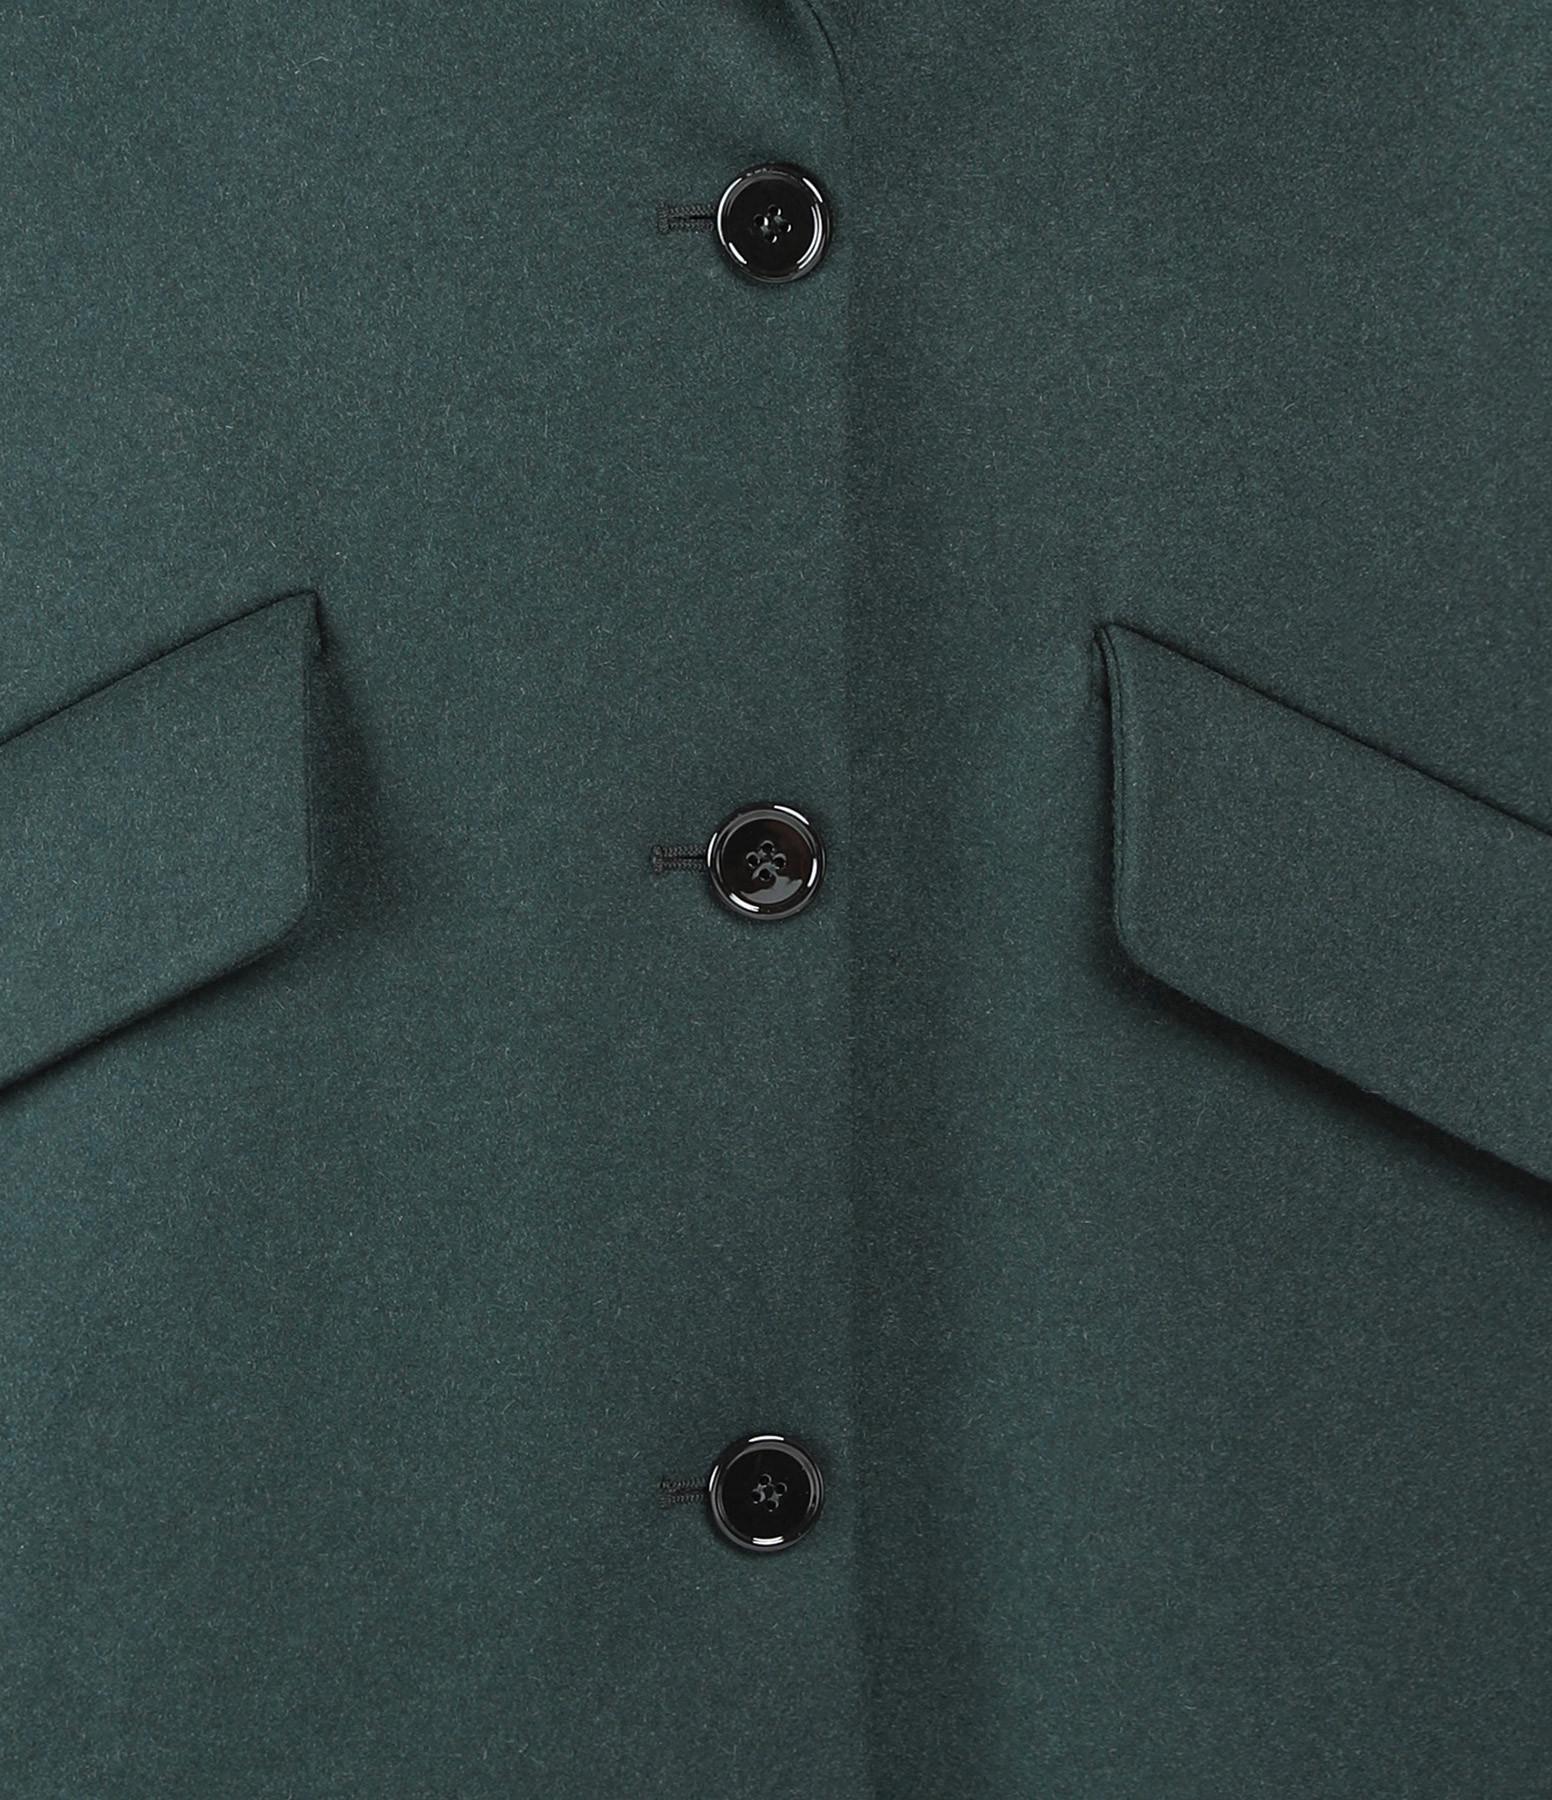 MM6 MAISON MARGIELA - Manteau Laine Oversize Vert Canard